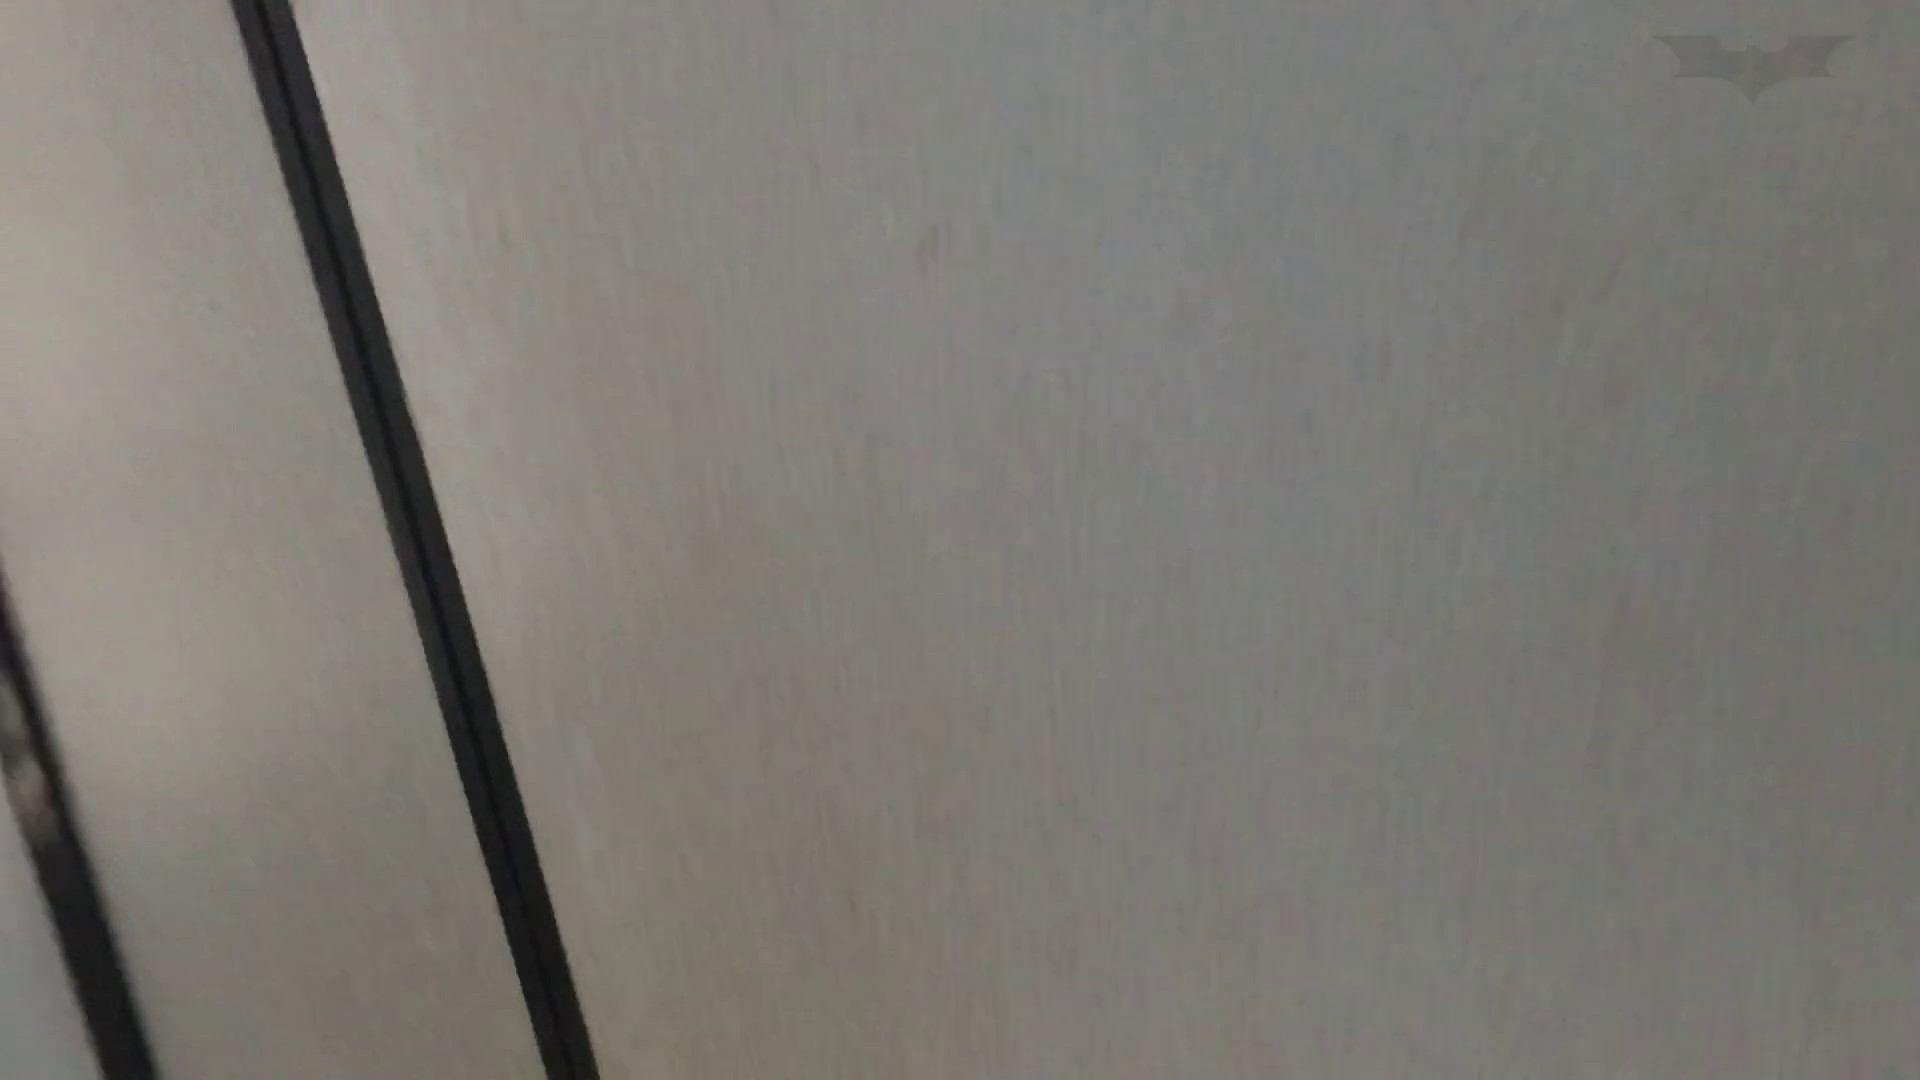 芸術大学ガチ潜入盗撮 JD盗撮 美女の洗面所の秘密 Vol.80 美女 セックス無修正動画無料 57連発 38